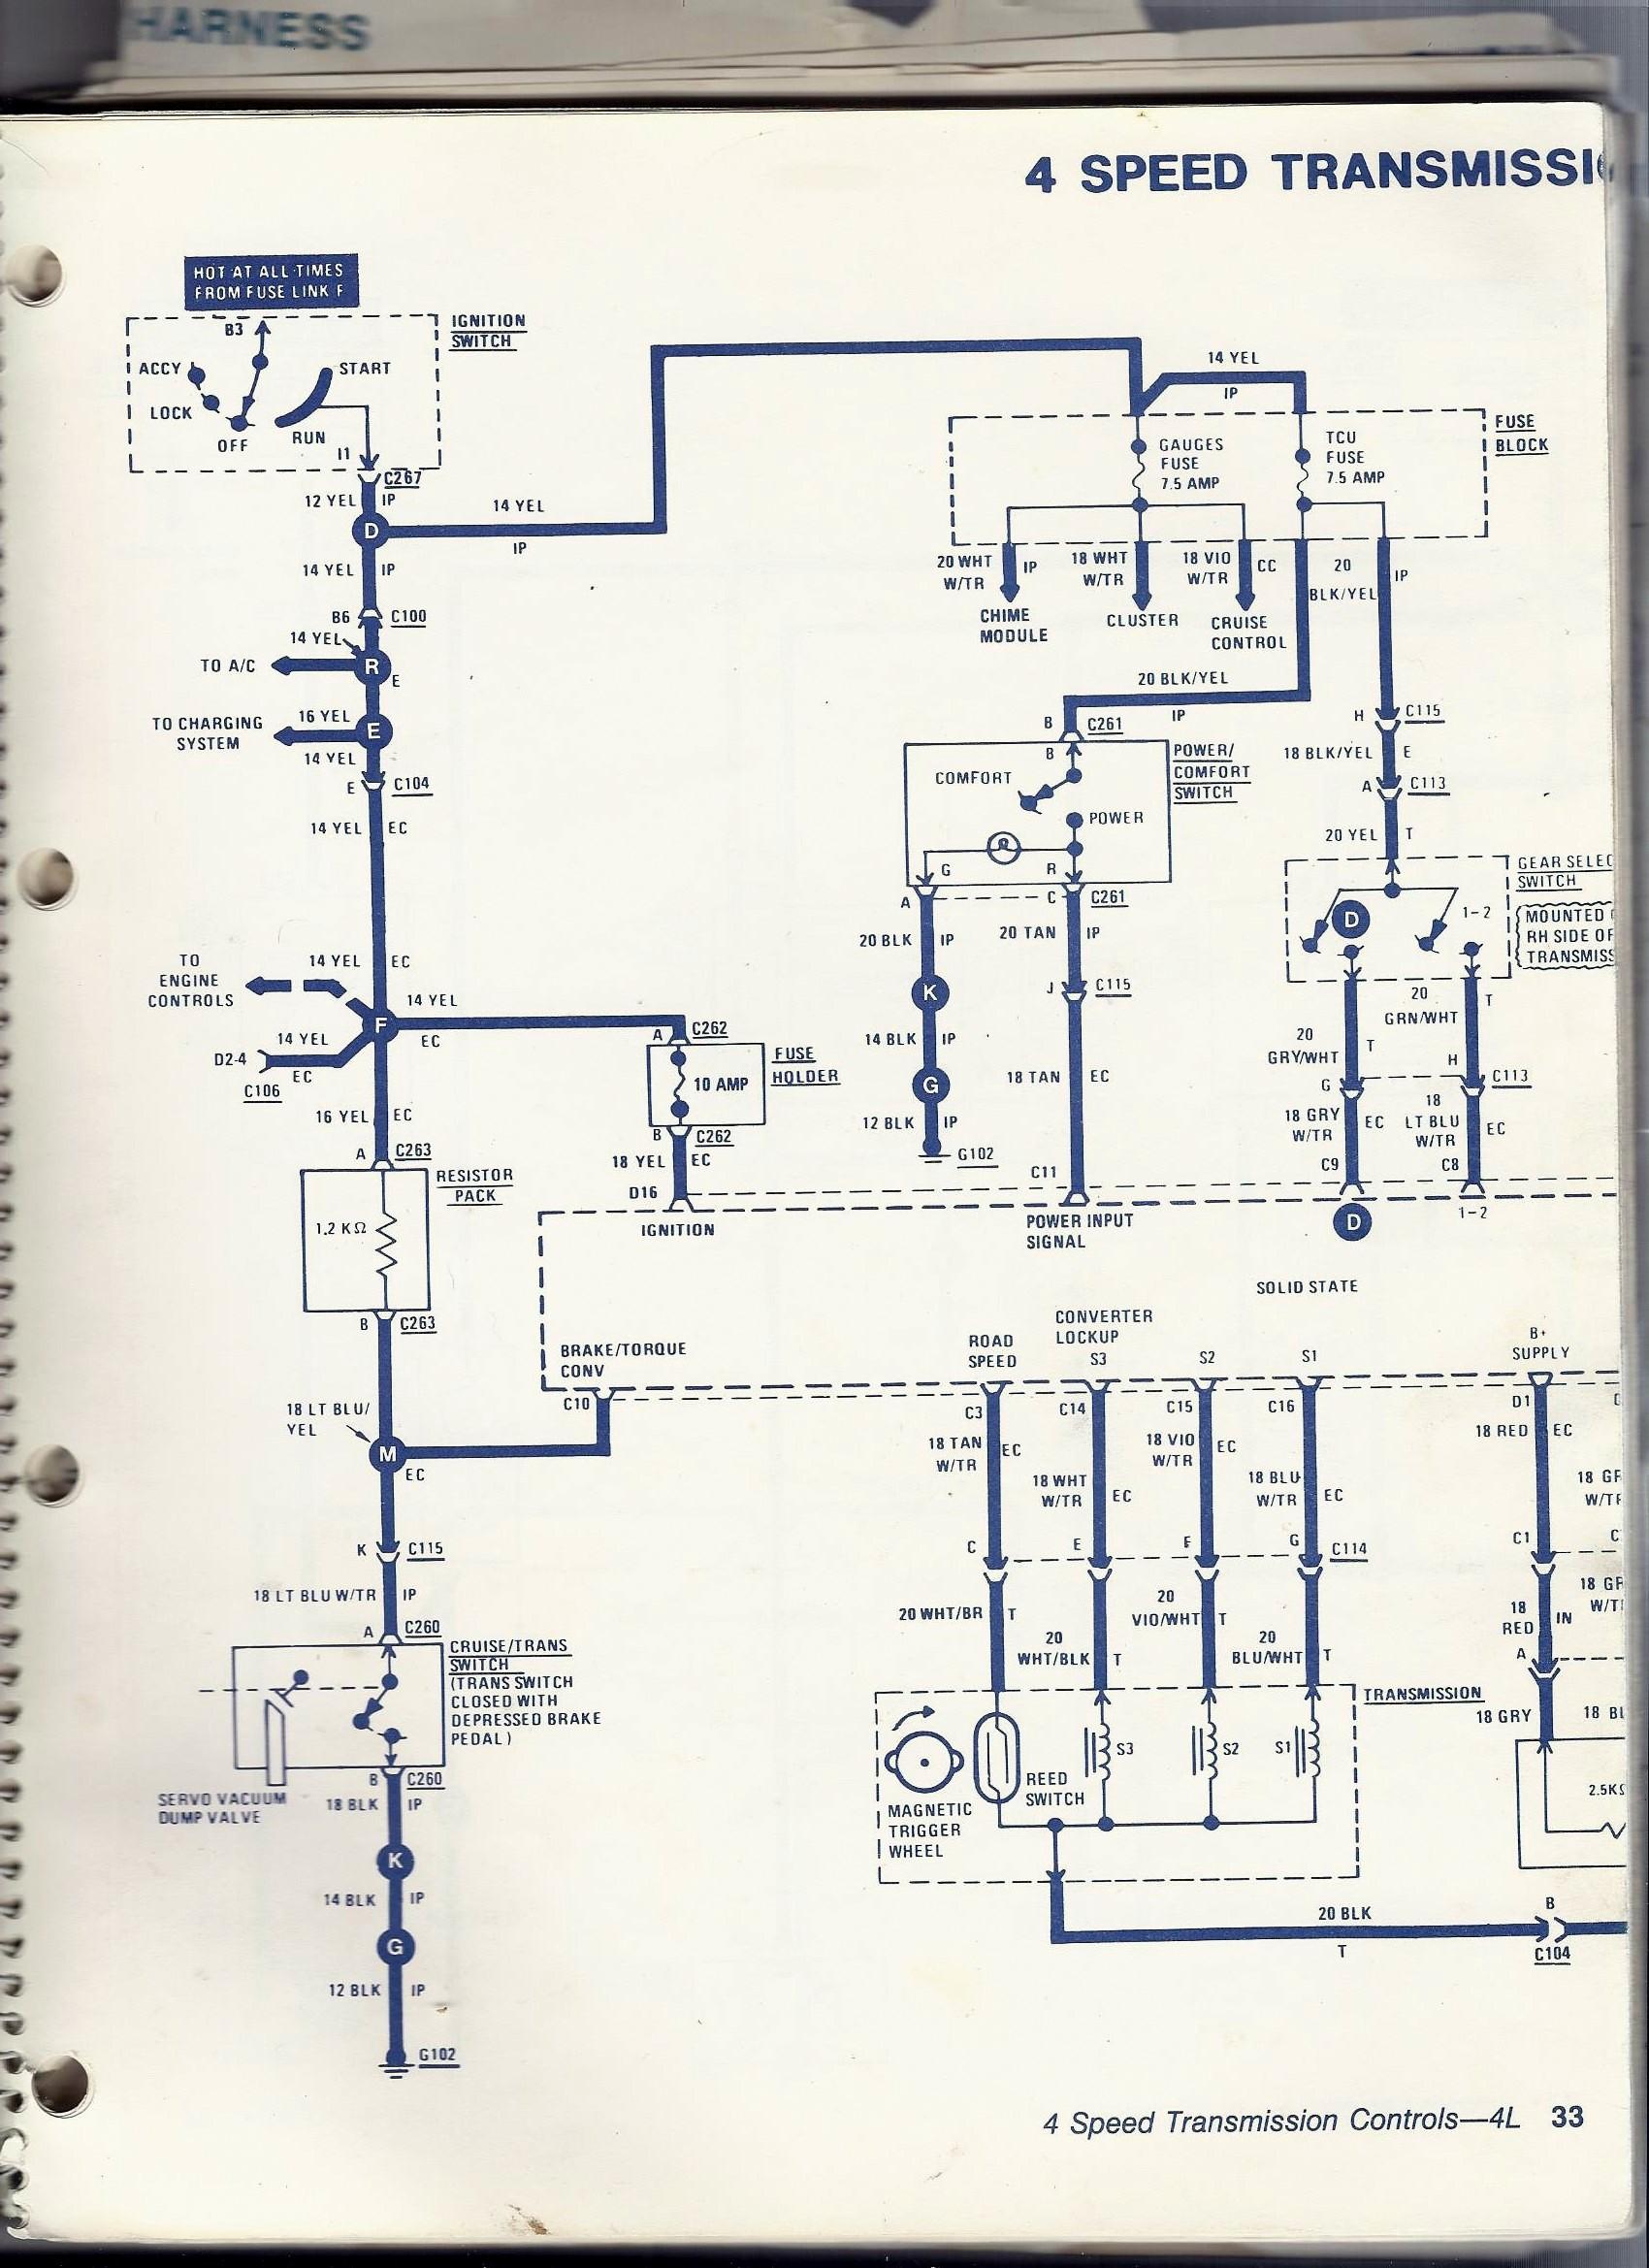 302231d1497829972 aw4 wiring diagram tcc wiring fsm?resize\=665%2C915\&ssl\=1 wiring daikin diagram dm96ve conventional fire alarm wiring diagram  at mr168.co